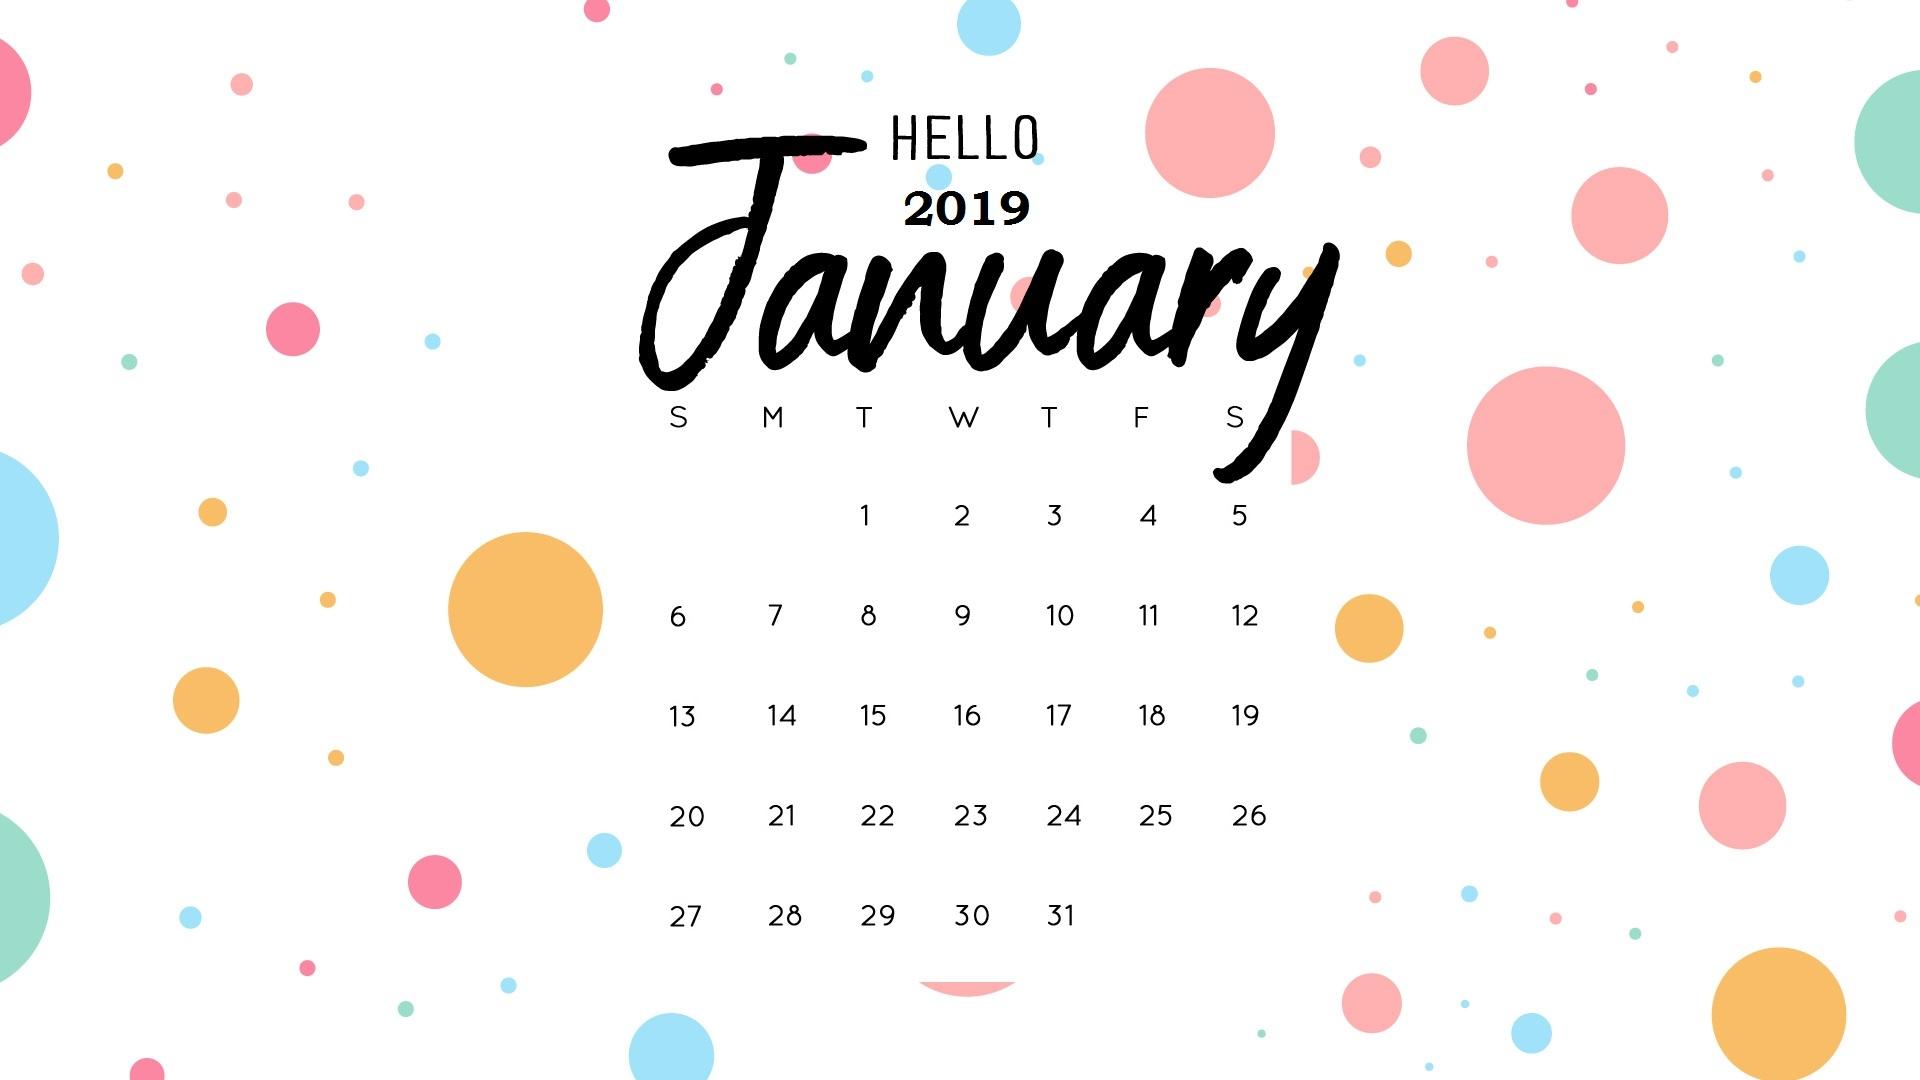 january 2019 calendar templates all about january calendar::January 2019 Calendar USA